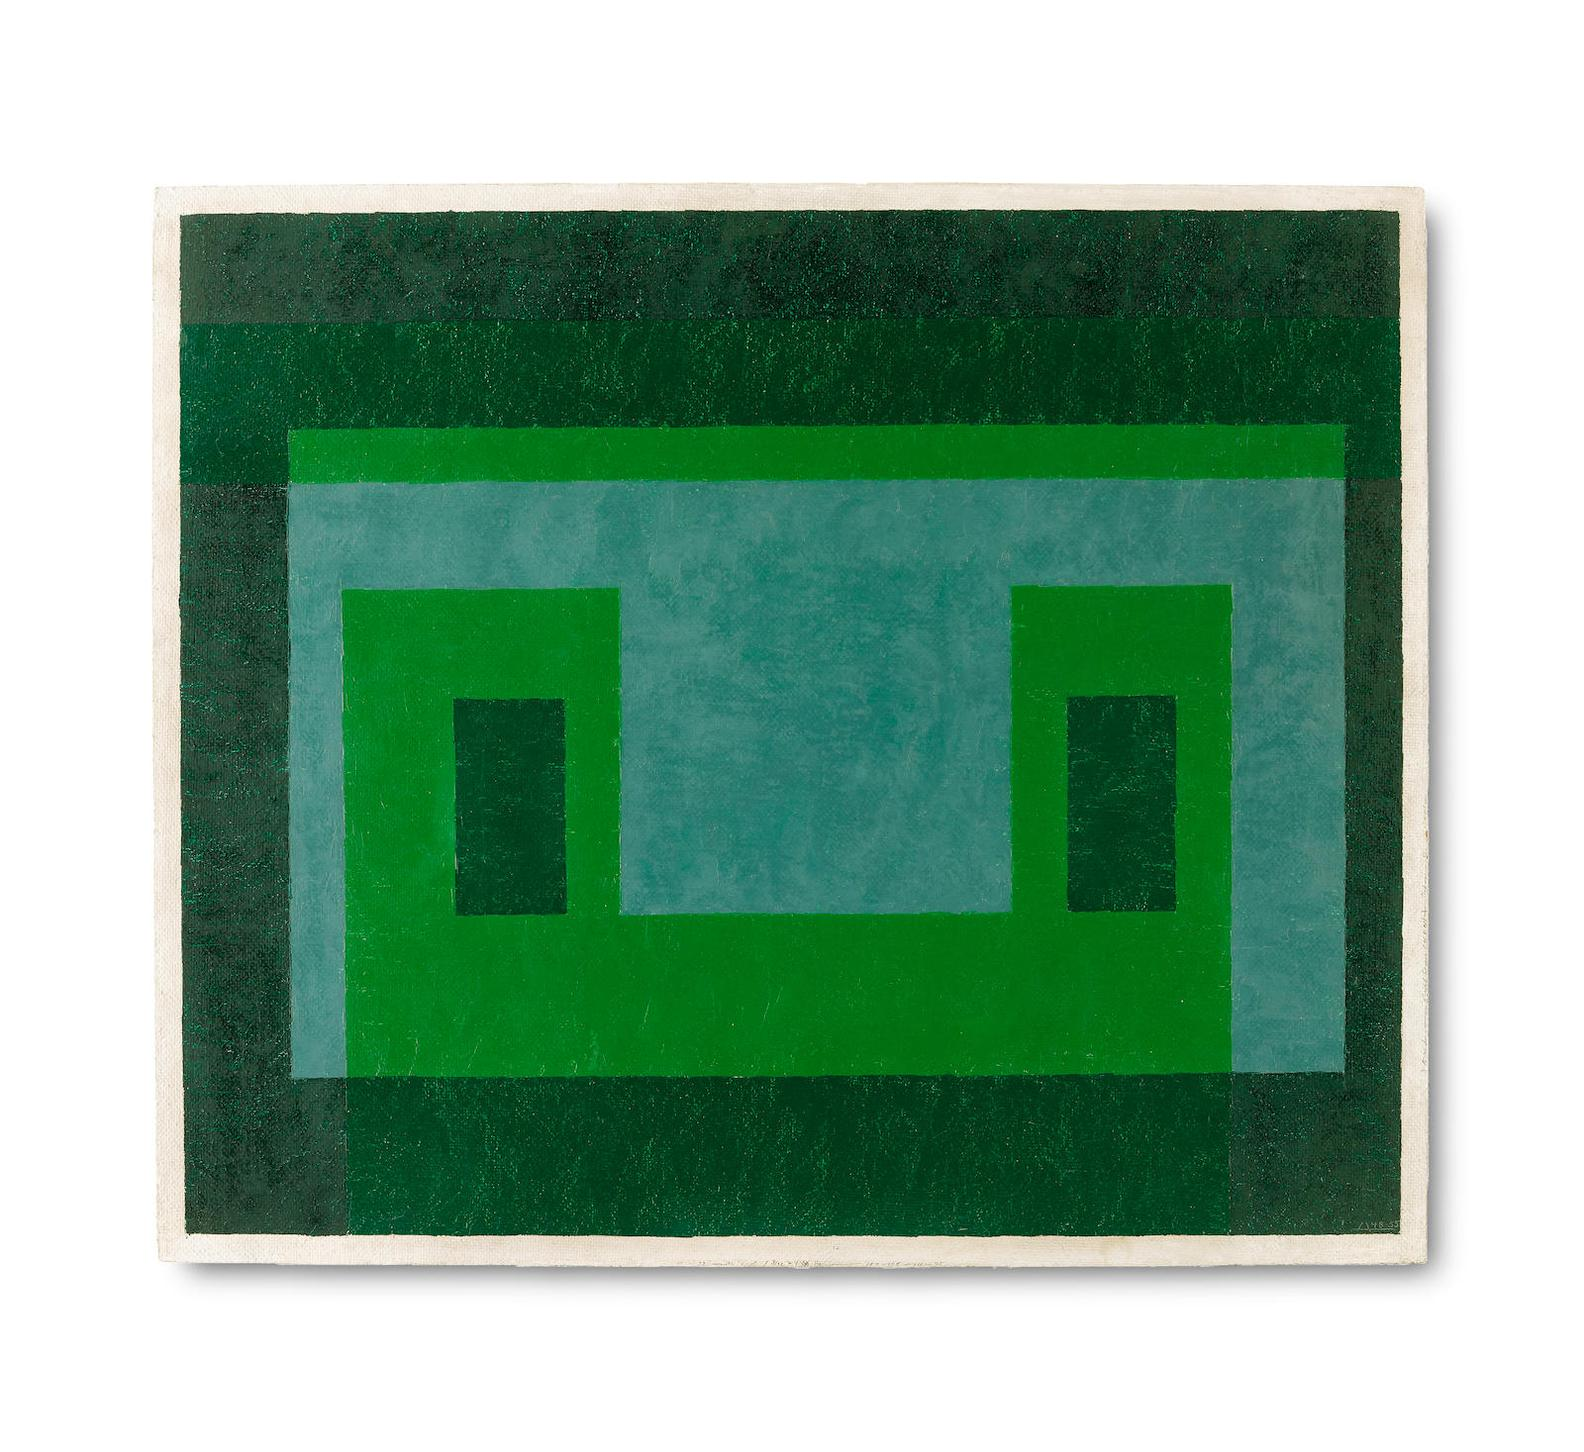 Josef Albers-Contented Green-1955